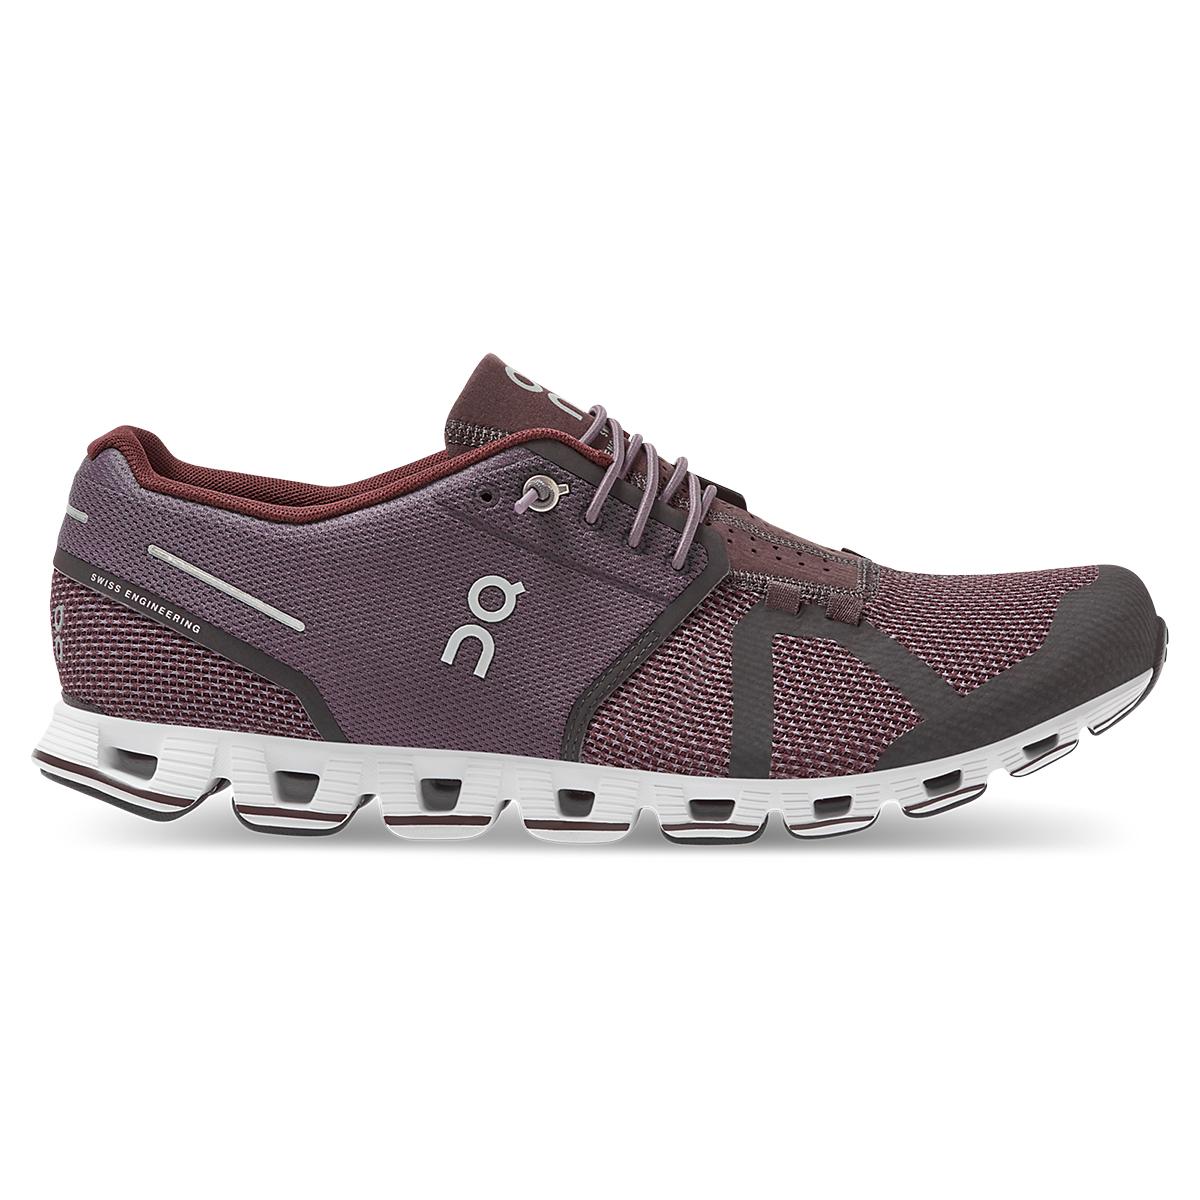 Men's On Cloud Running Shoe - Color: Pebble/Raisin - Size: 7.5 - Width: Regular, Pebble/Raisin, large, image 1